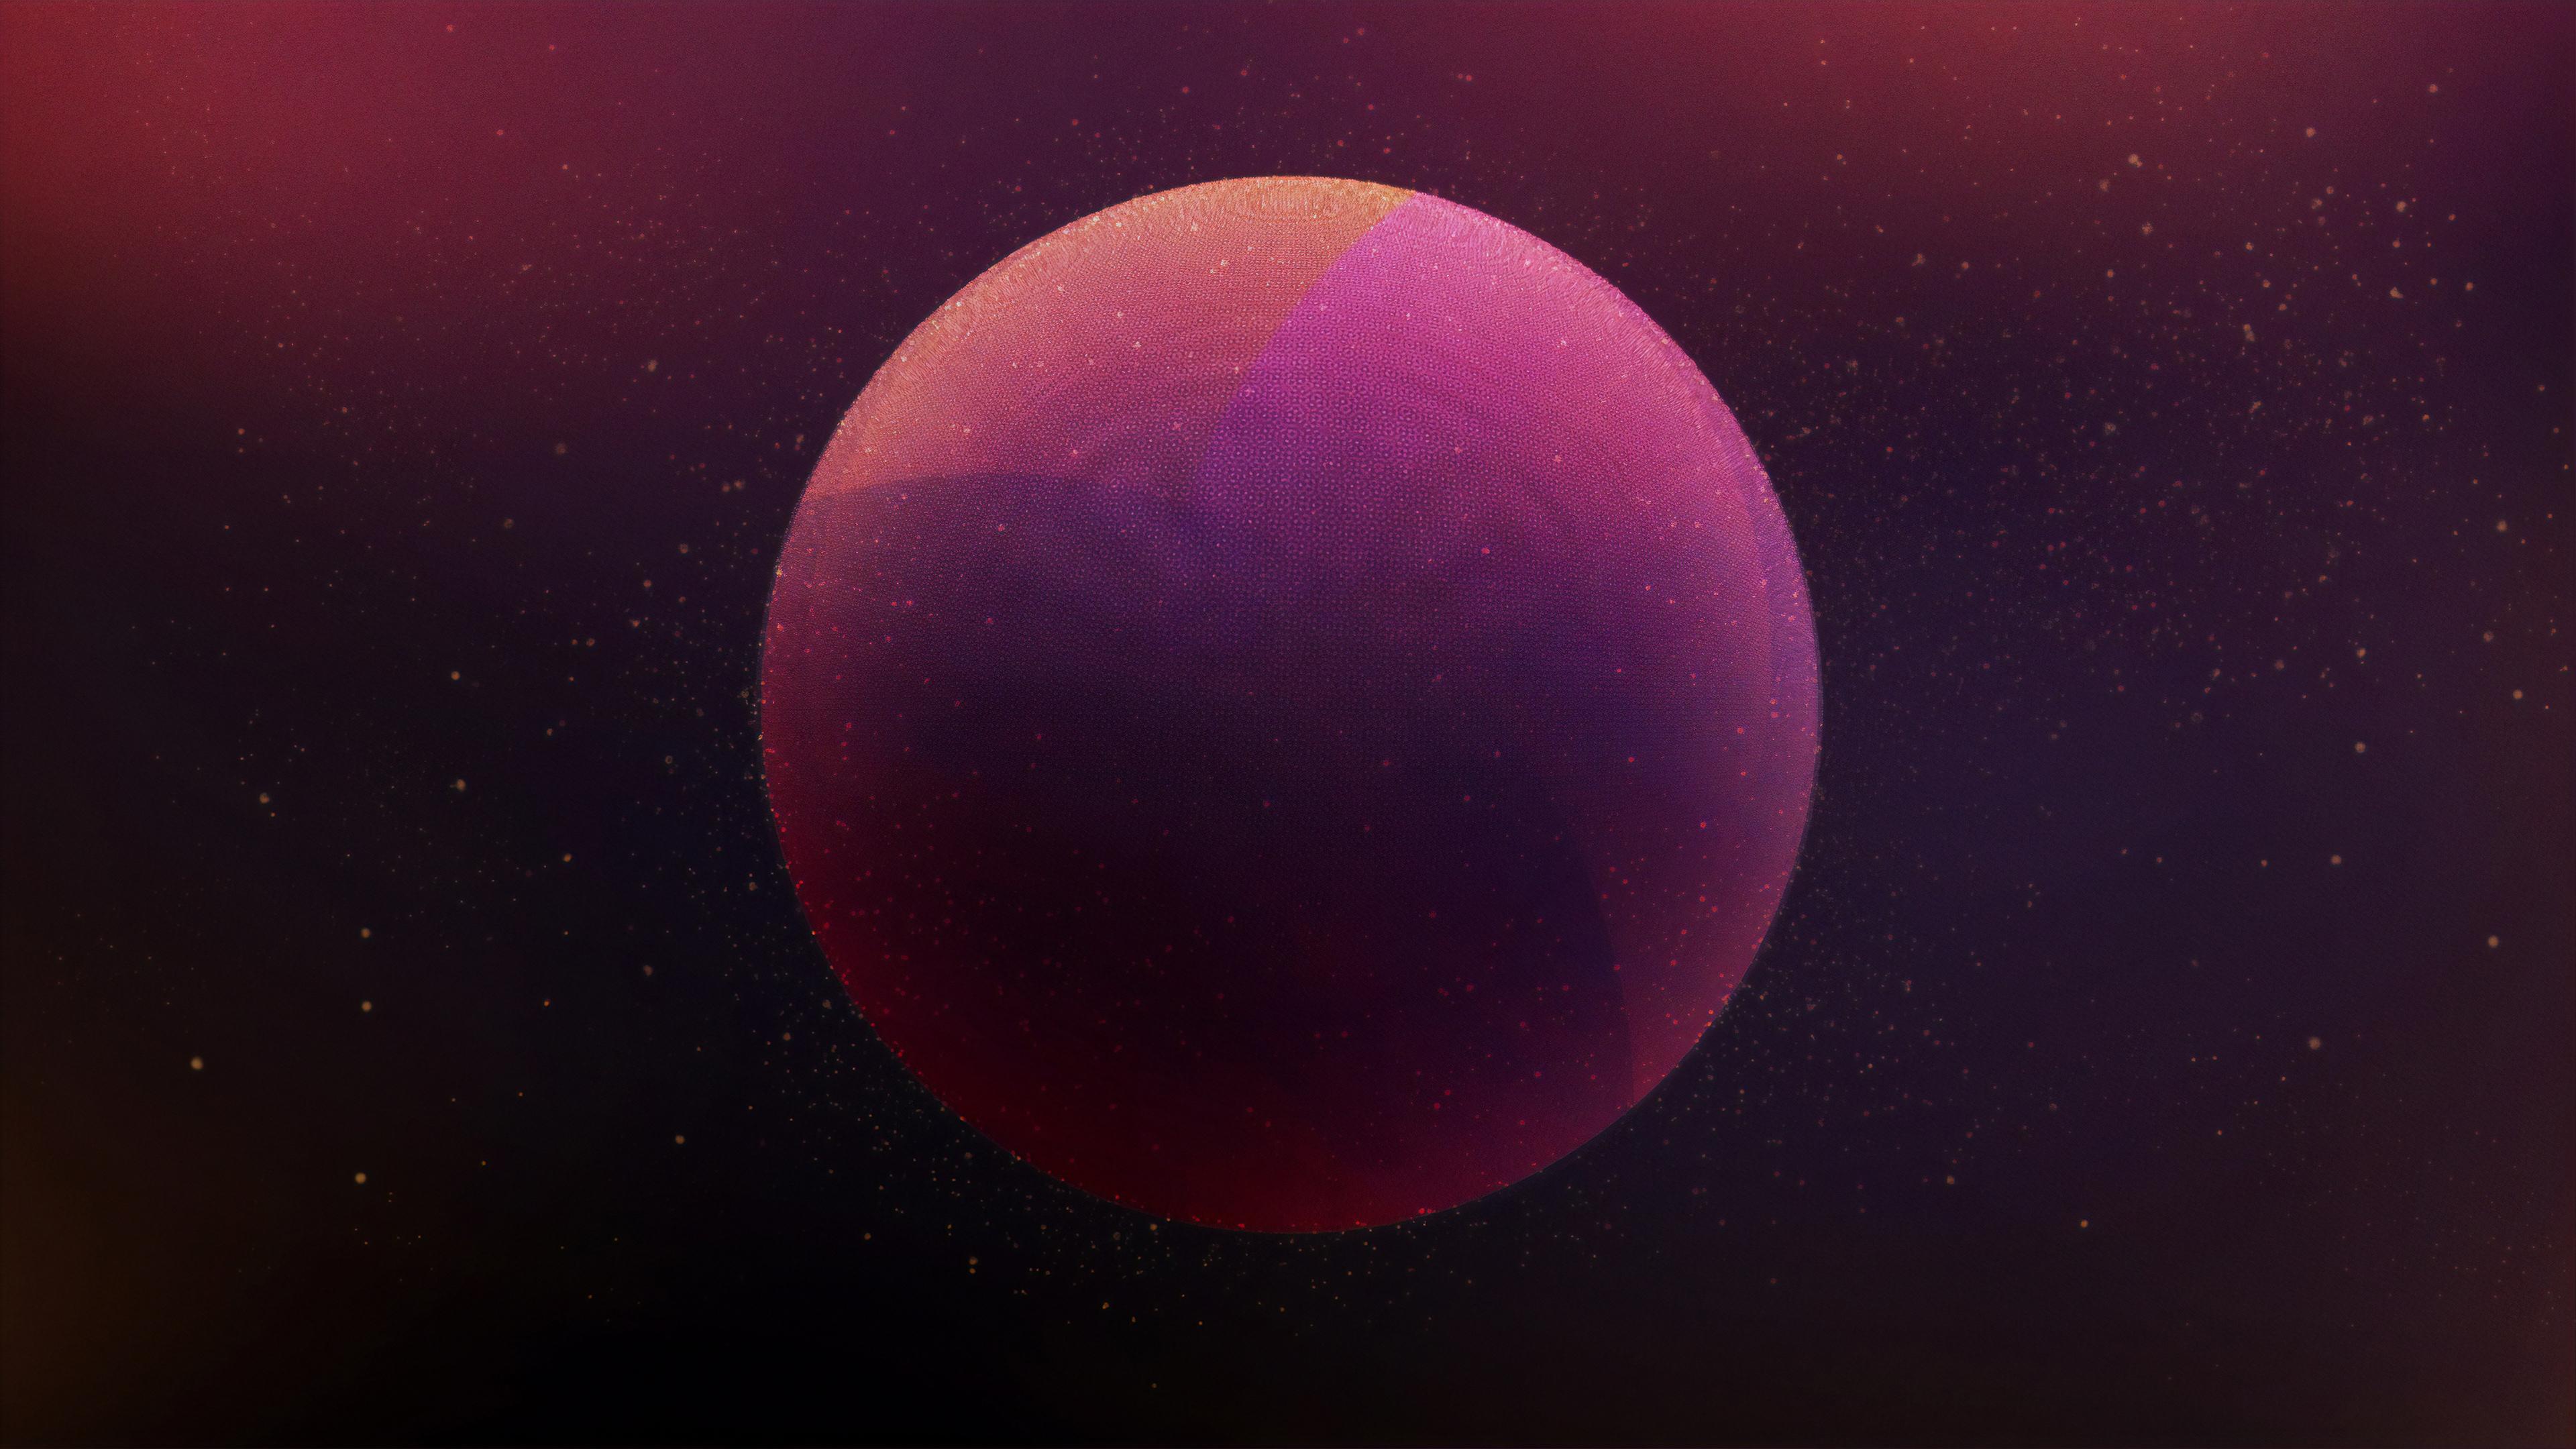 purple sphere planet 1574943069 - Purple Sphere Planet -